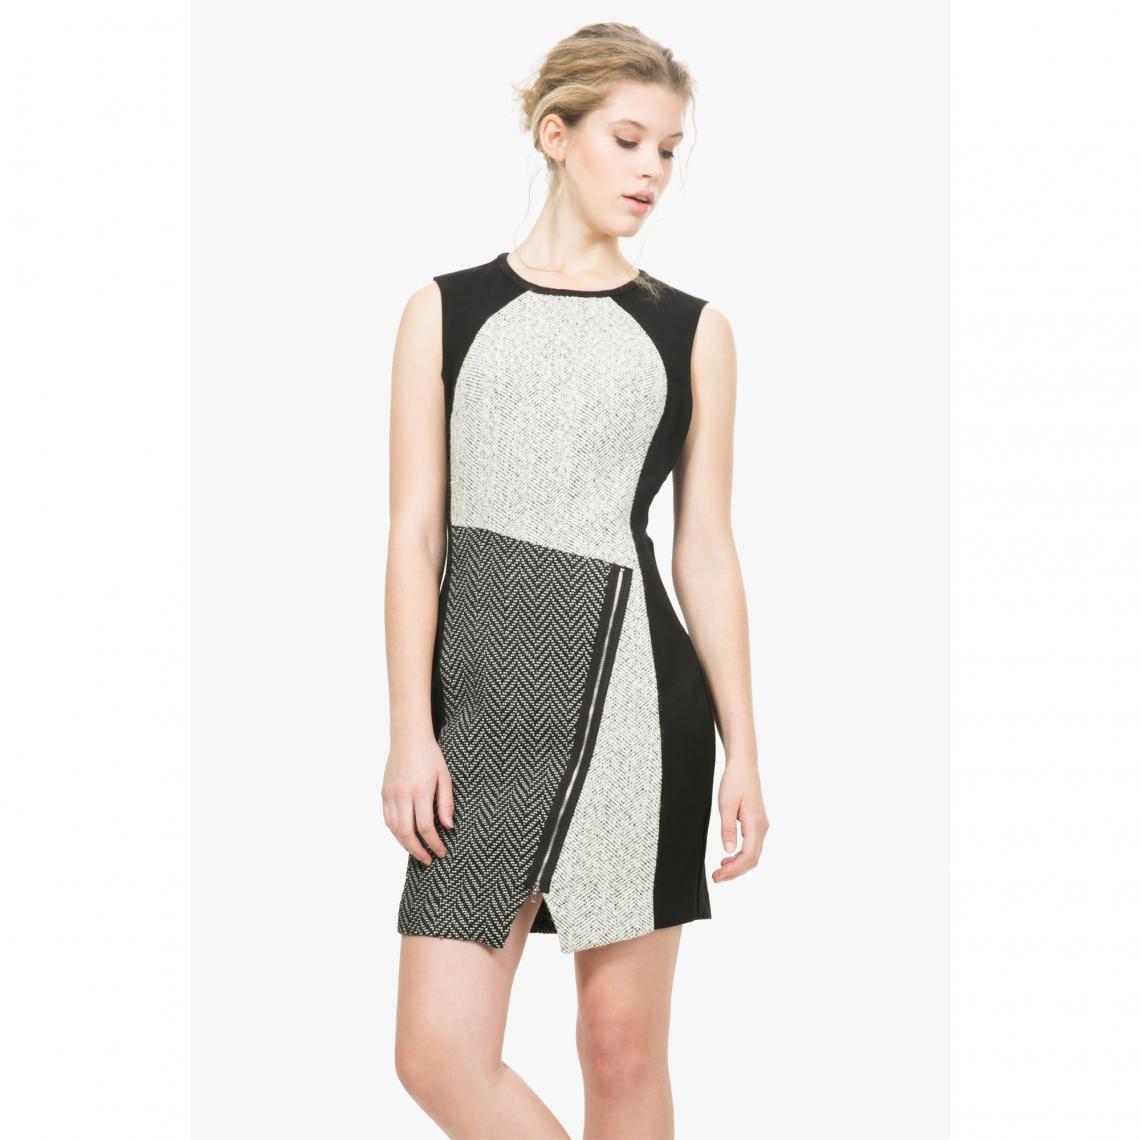 b1bbcaef07afa Robe imprimée patchwork femme Oceano Desigual - Blanc - Noir Desigual Femme